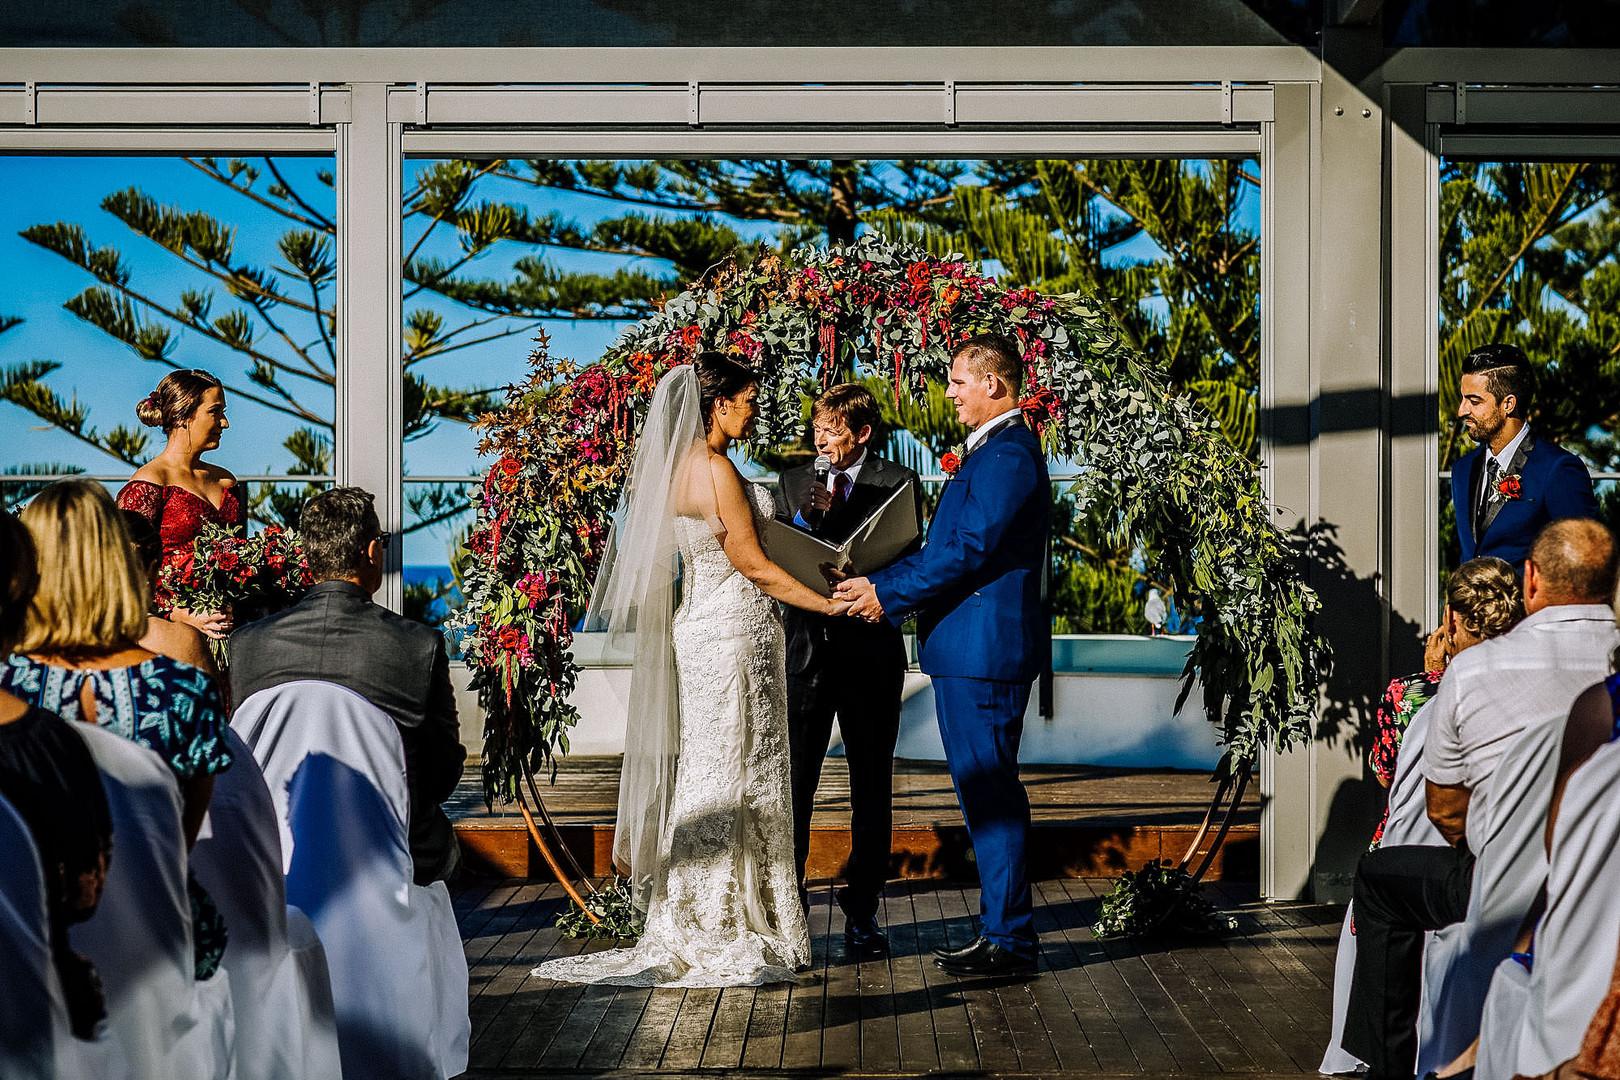 WeddingWebsite_Compressed-74.jpg